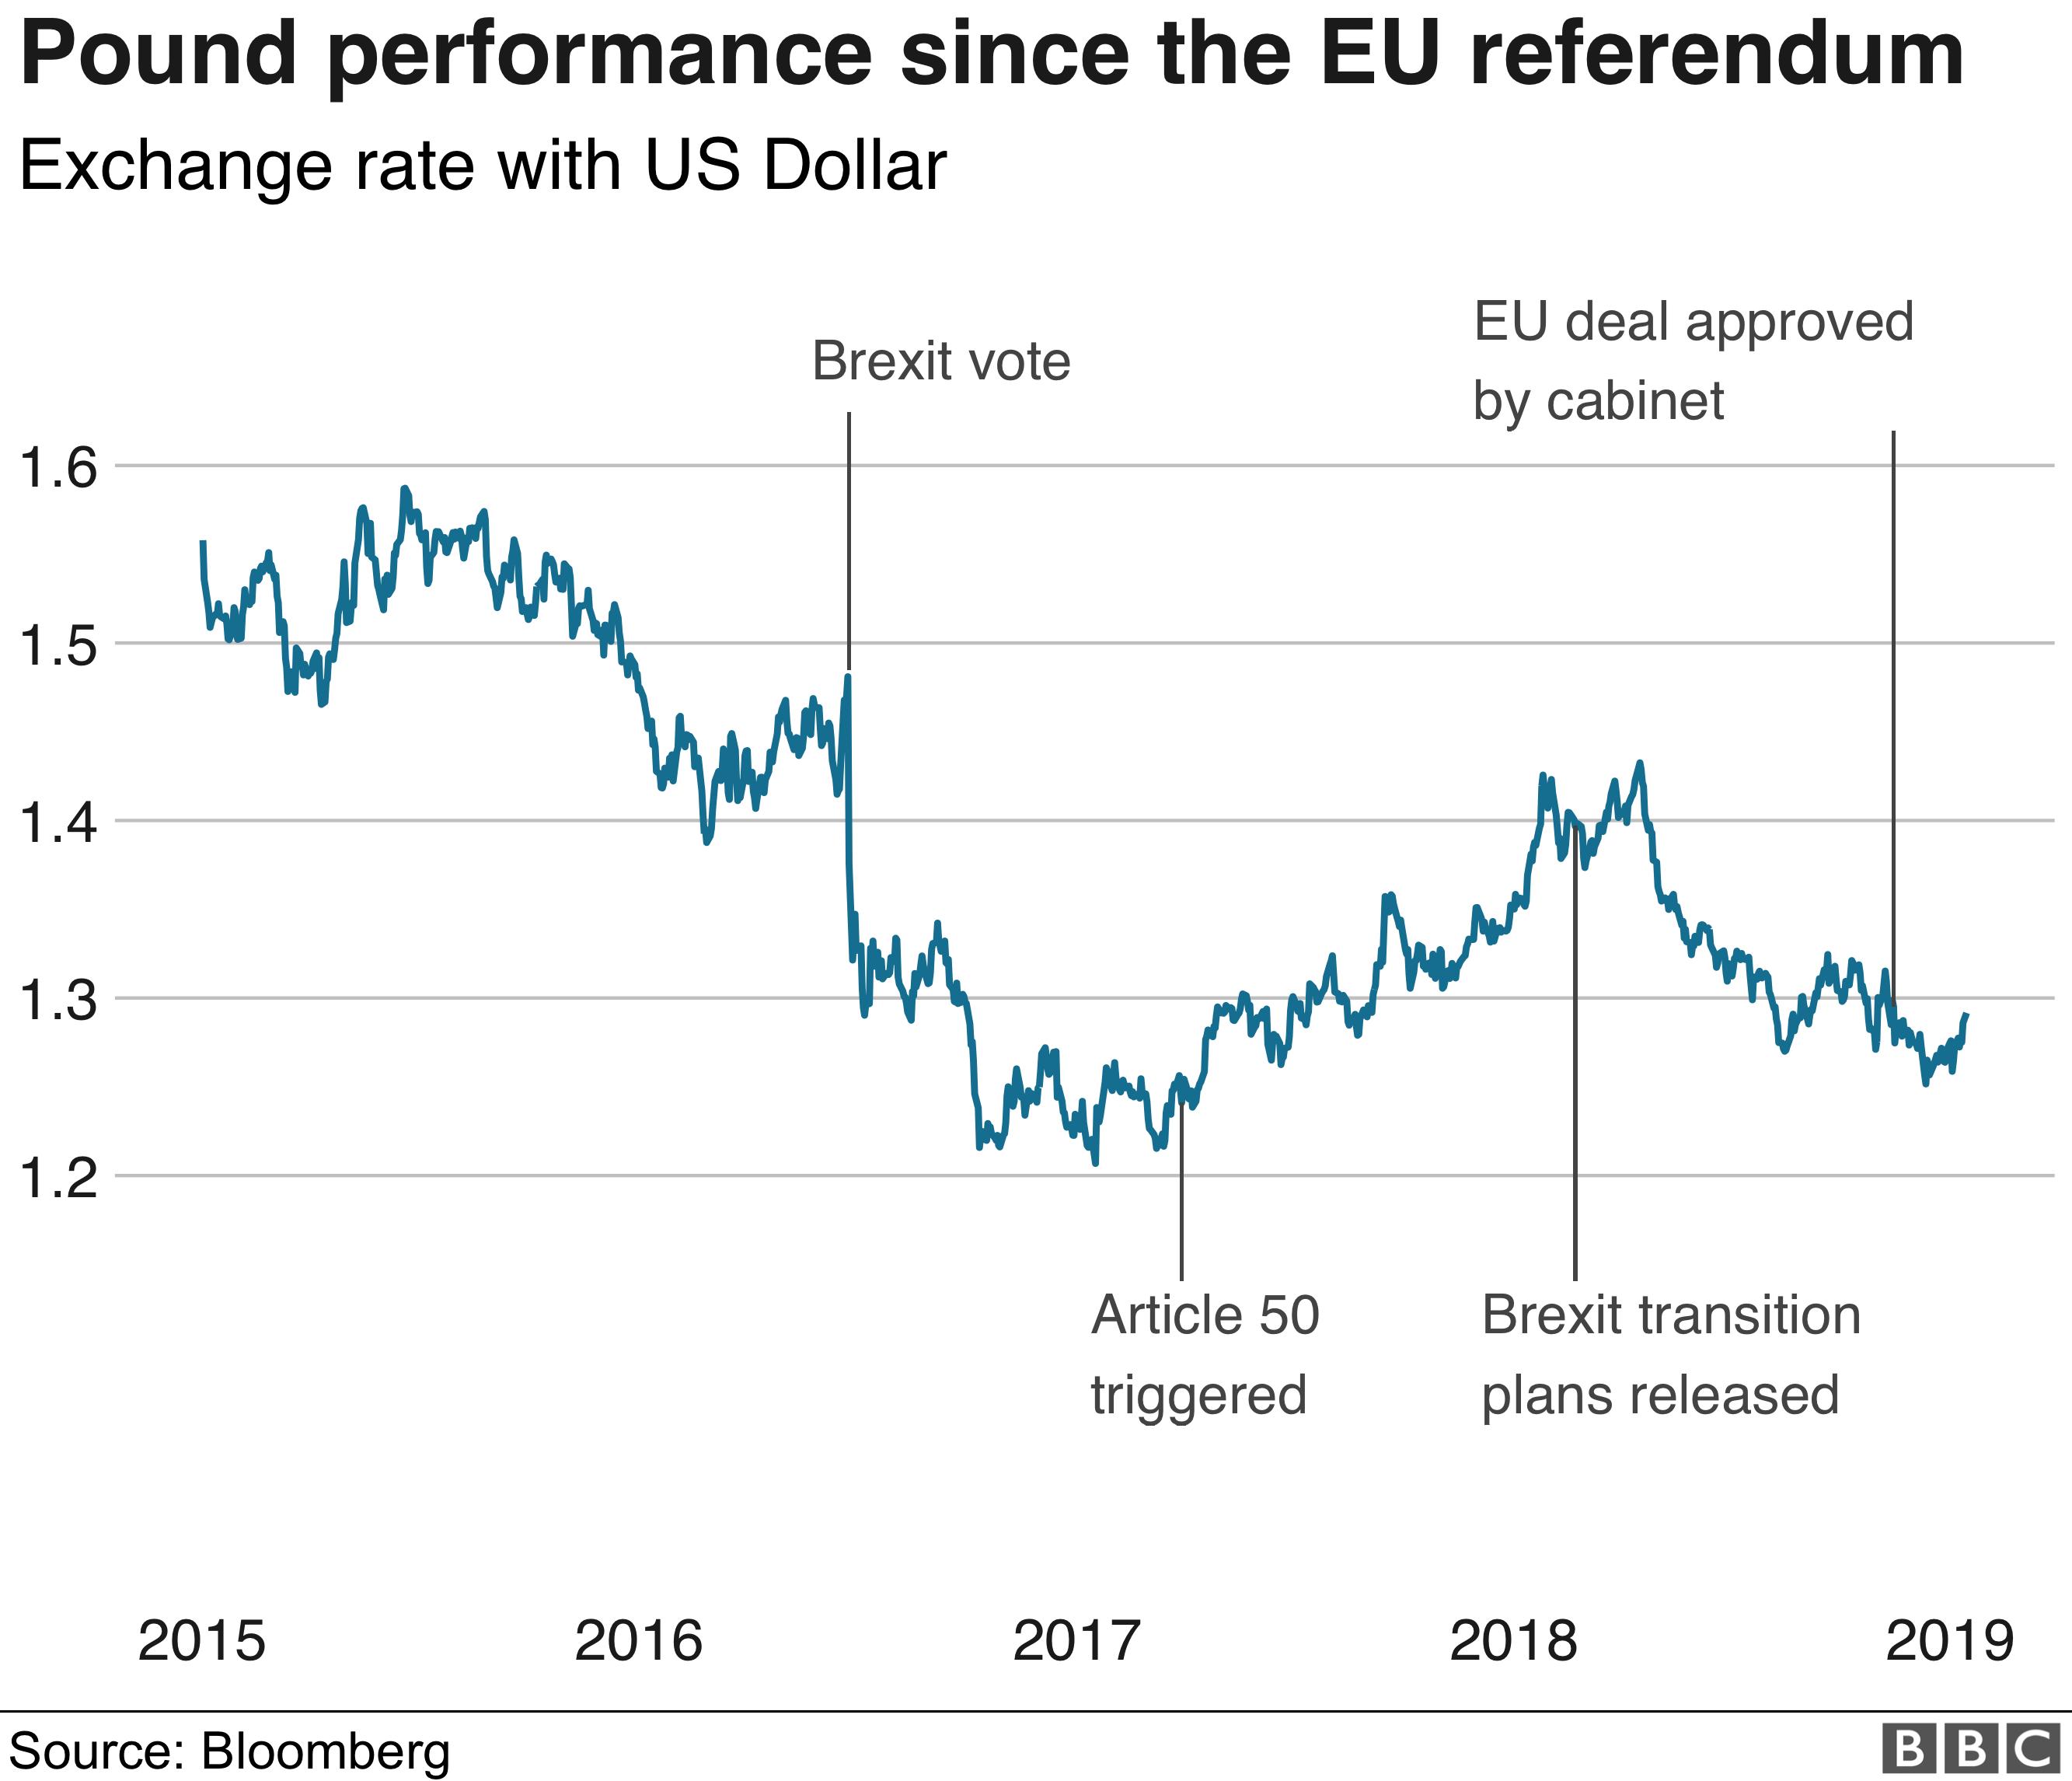 Pound since Brexit vote